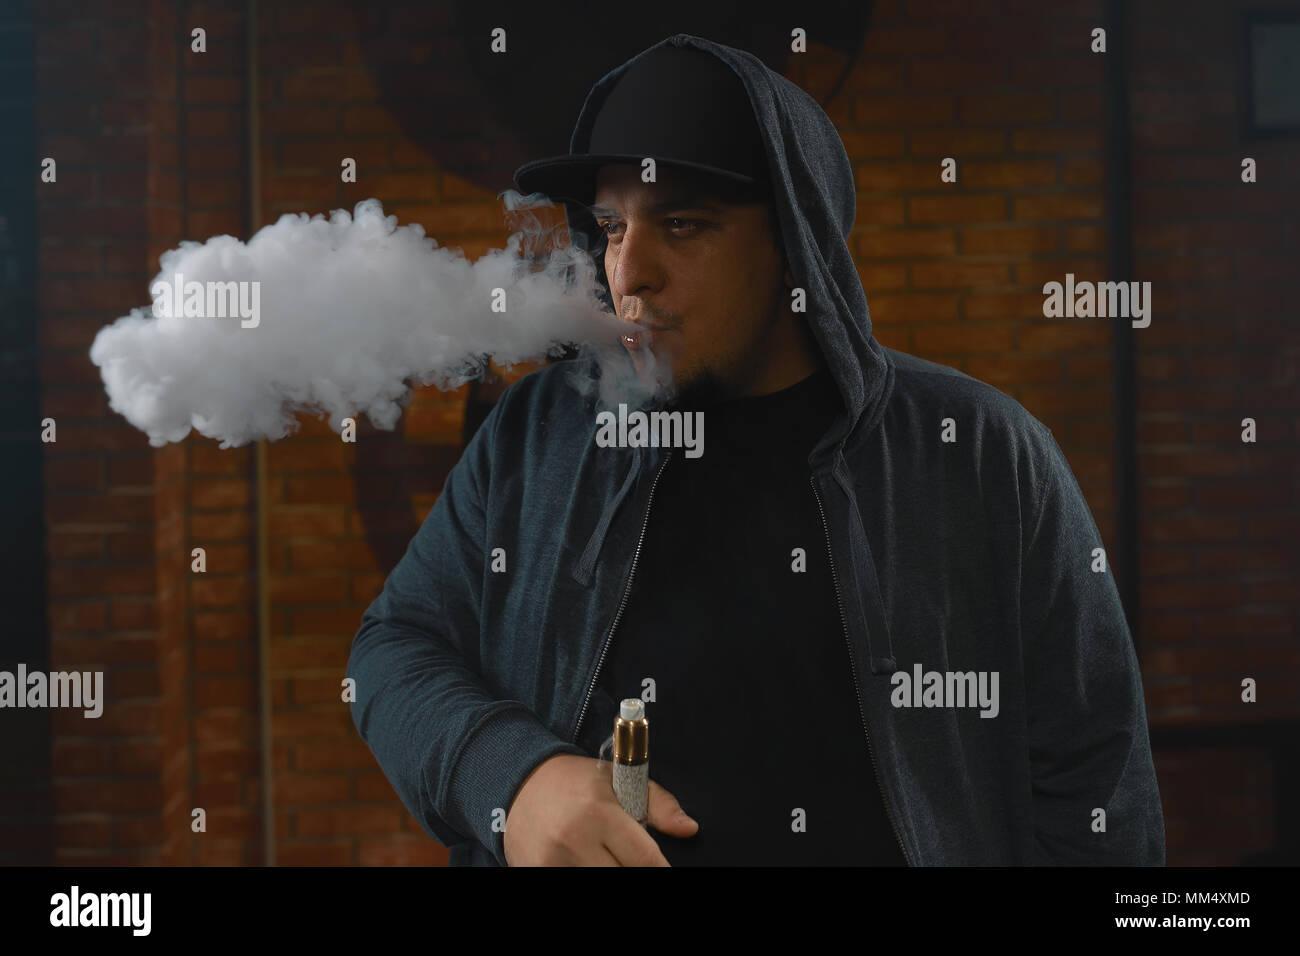 A cloud of vapor. Vaping man holding a mod. Brick background. Vape concept. Young man with beard vaping an electronic cigarette. Vaper hipster smoke v - Stock Image